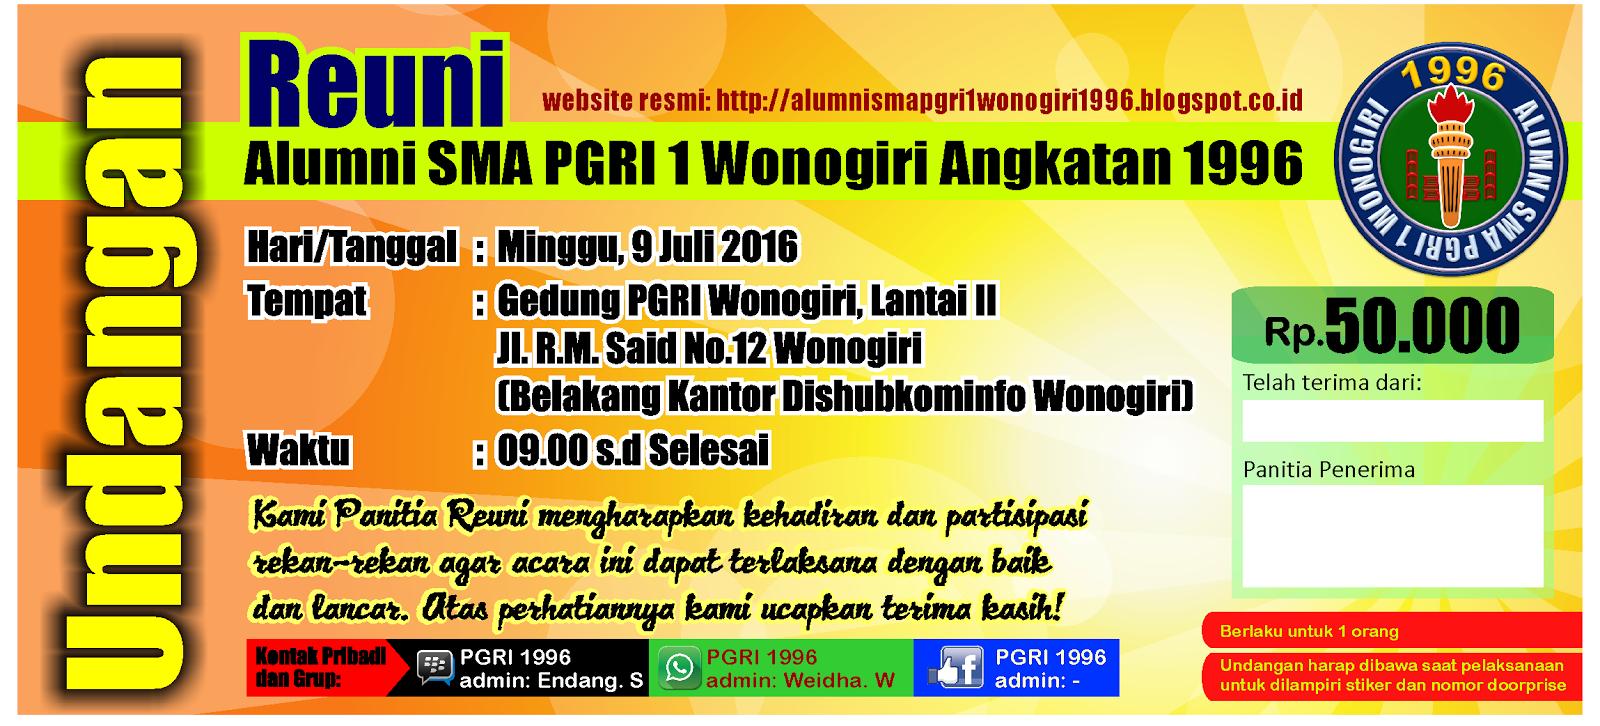 Paguyuban Alumni Sma Pgri 1 Wonogiri Angkatan 1996 Hasil Rapat